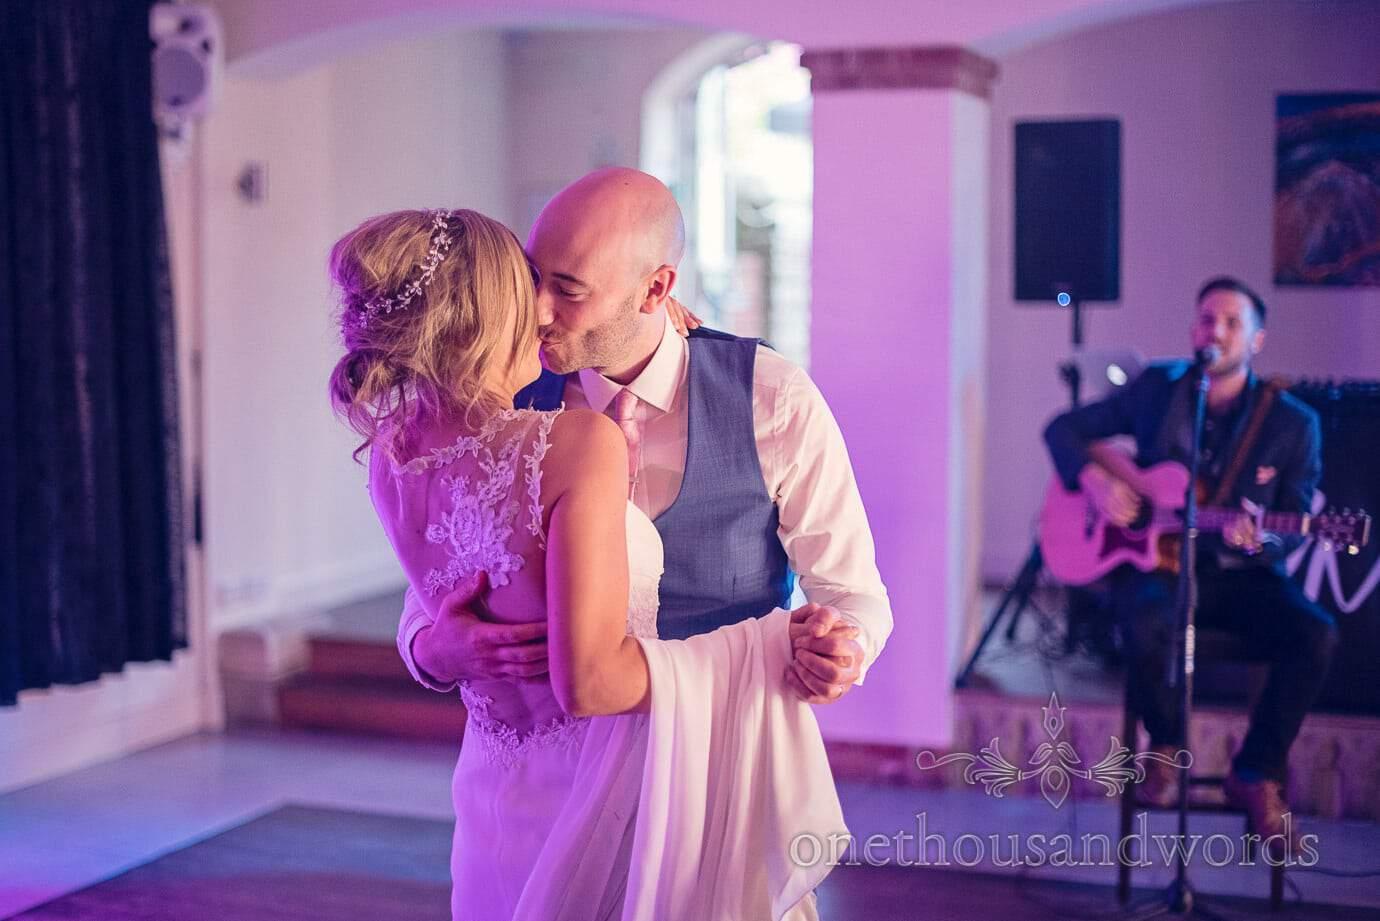 Kiss during first dance from Italian Villa Wedding Photographs